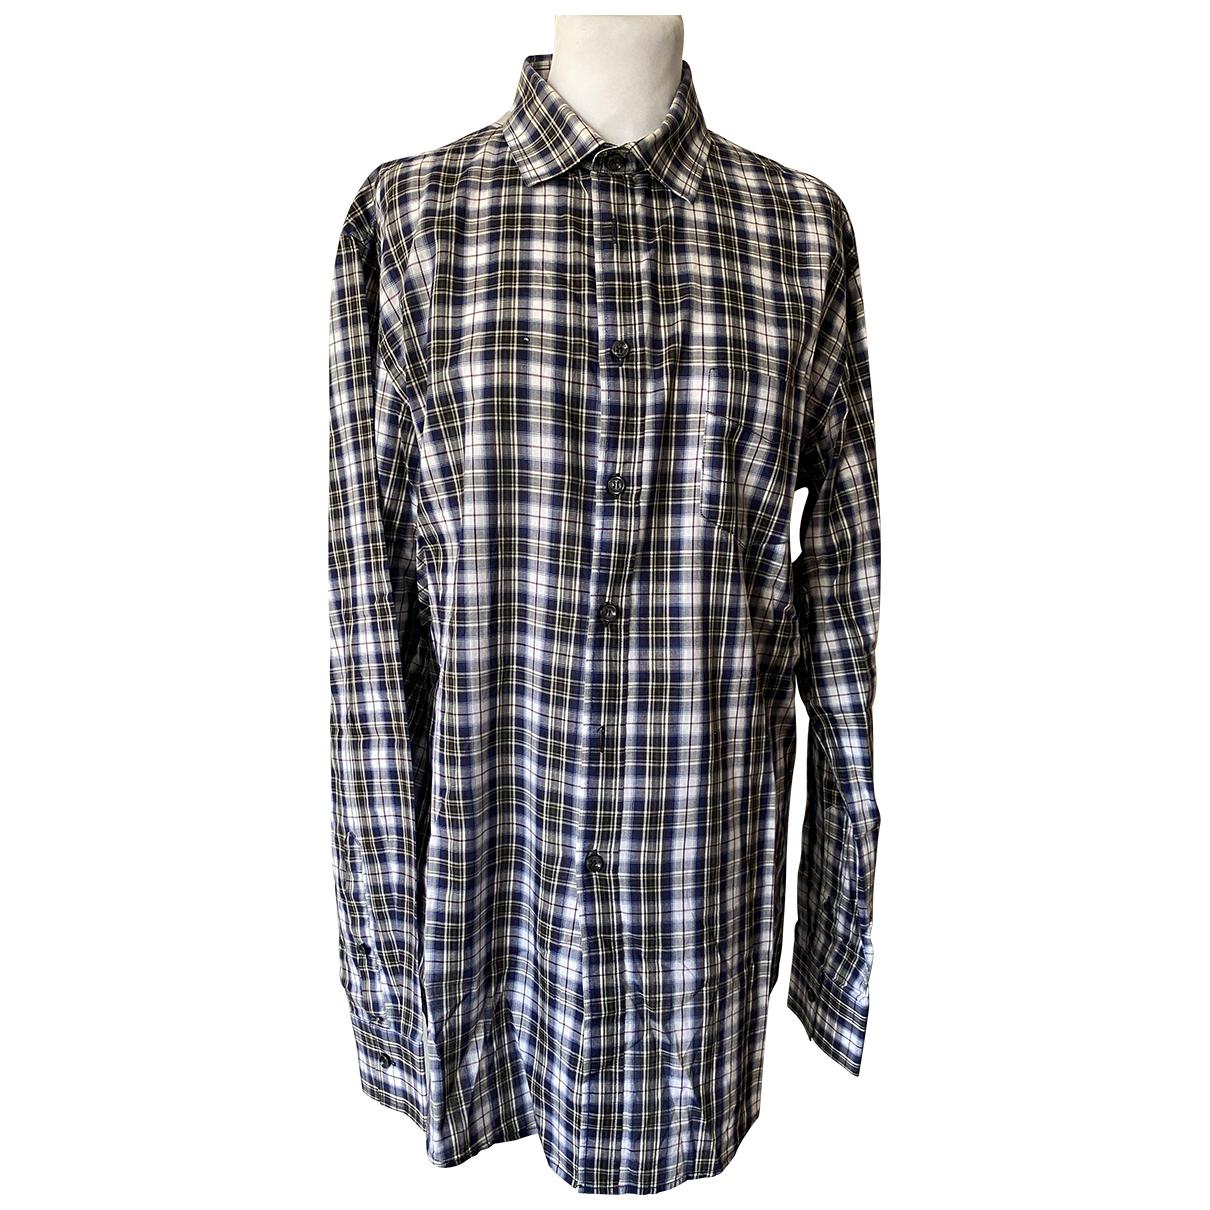 Benetton N Cotton Shirts for Men L International